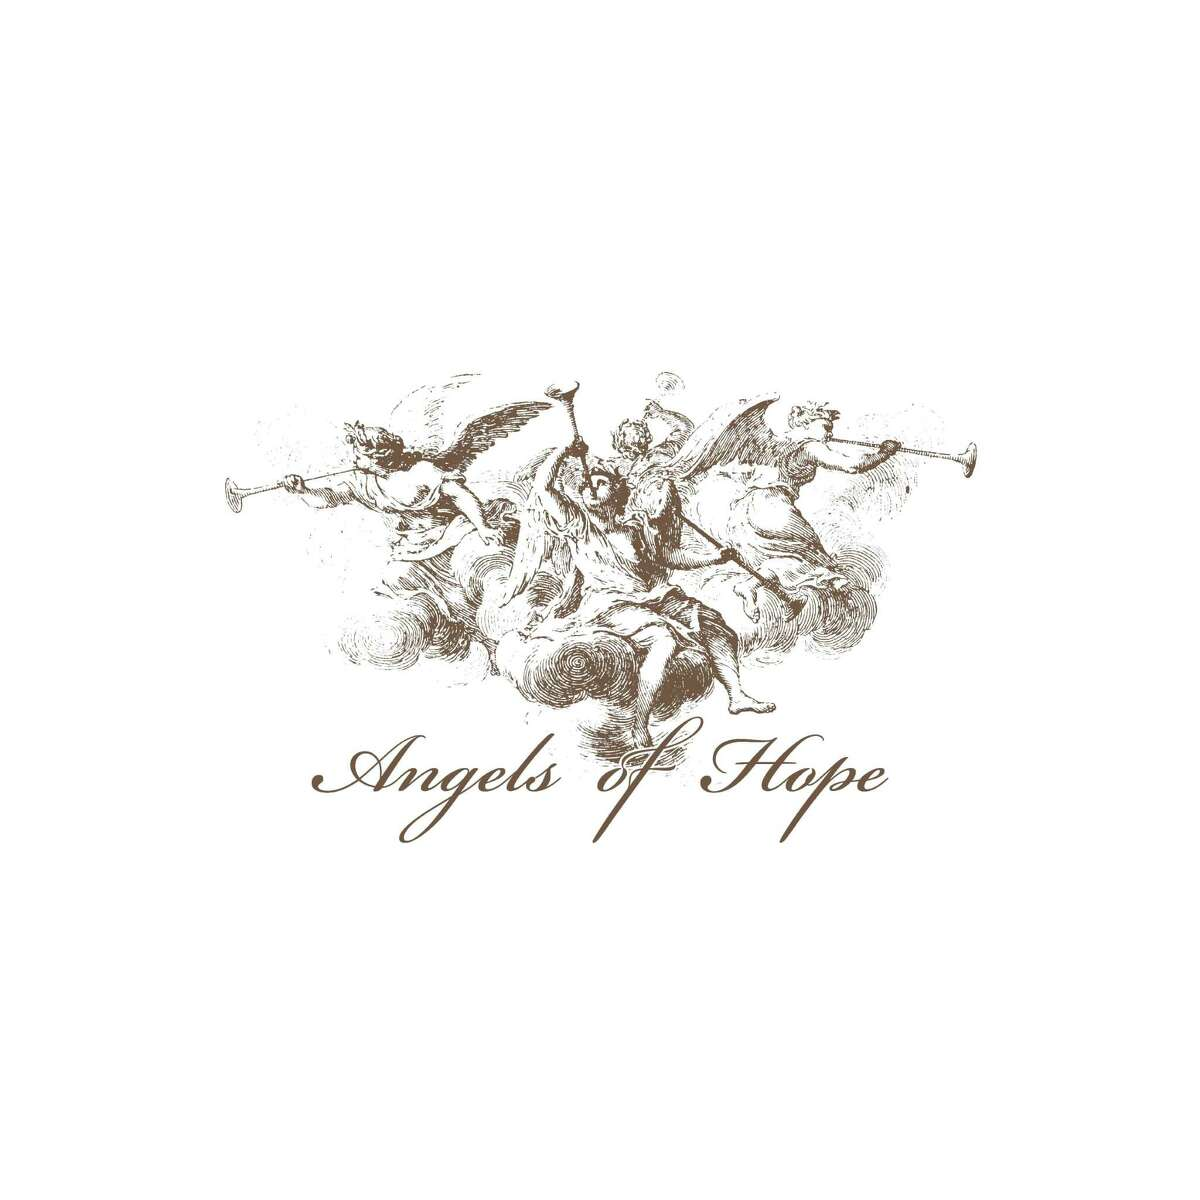 Angels of Hope